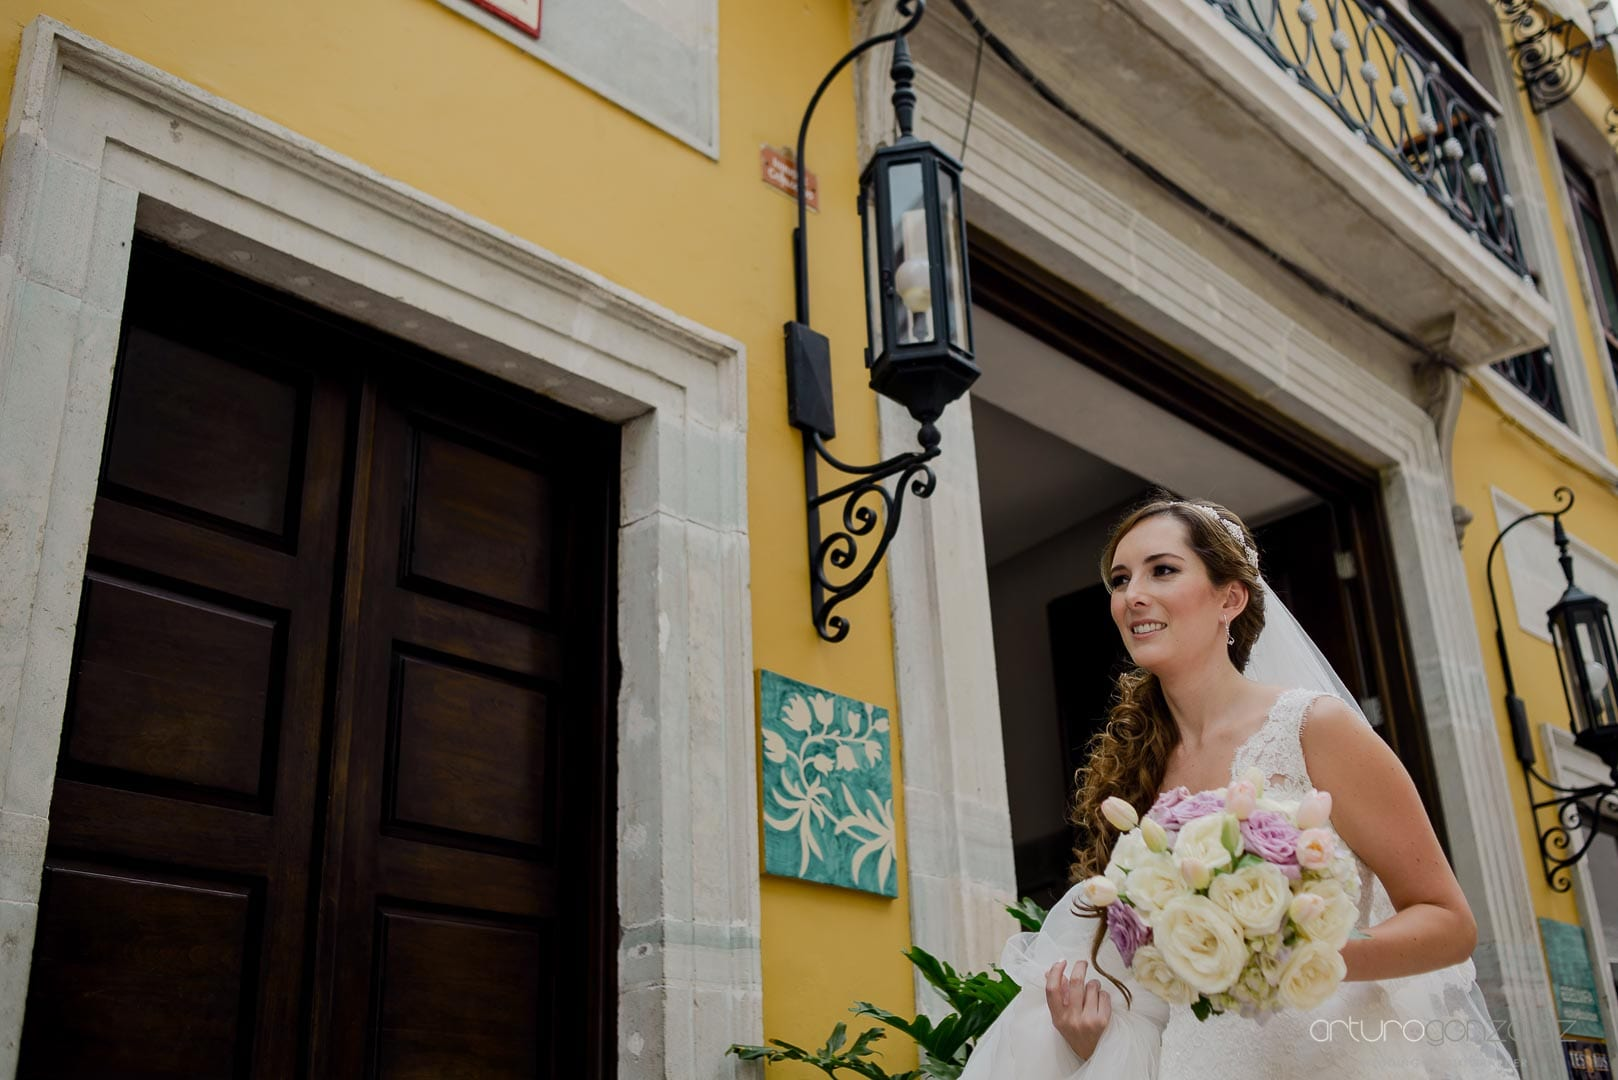 fotografo-de-bodas-en-guanajuato-26